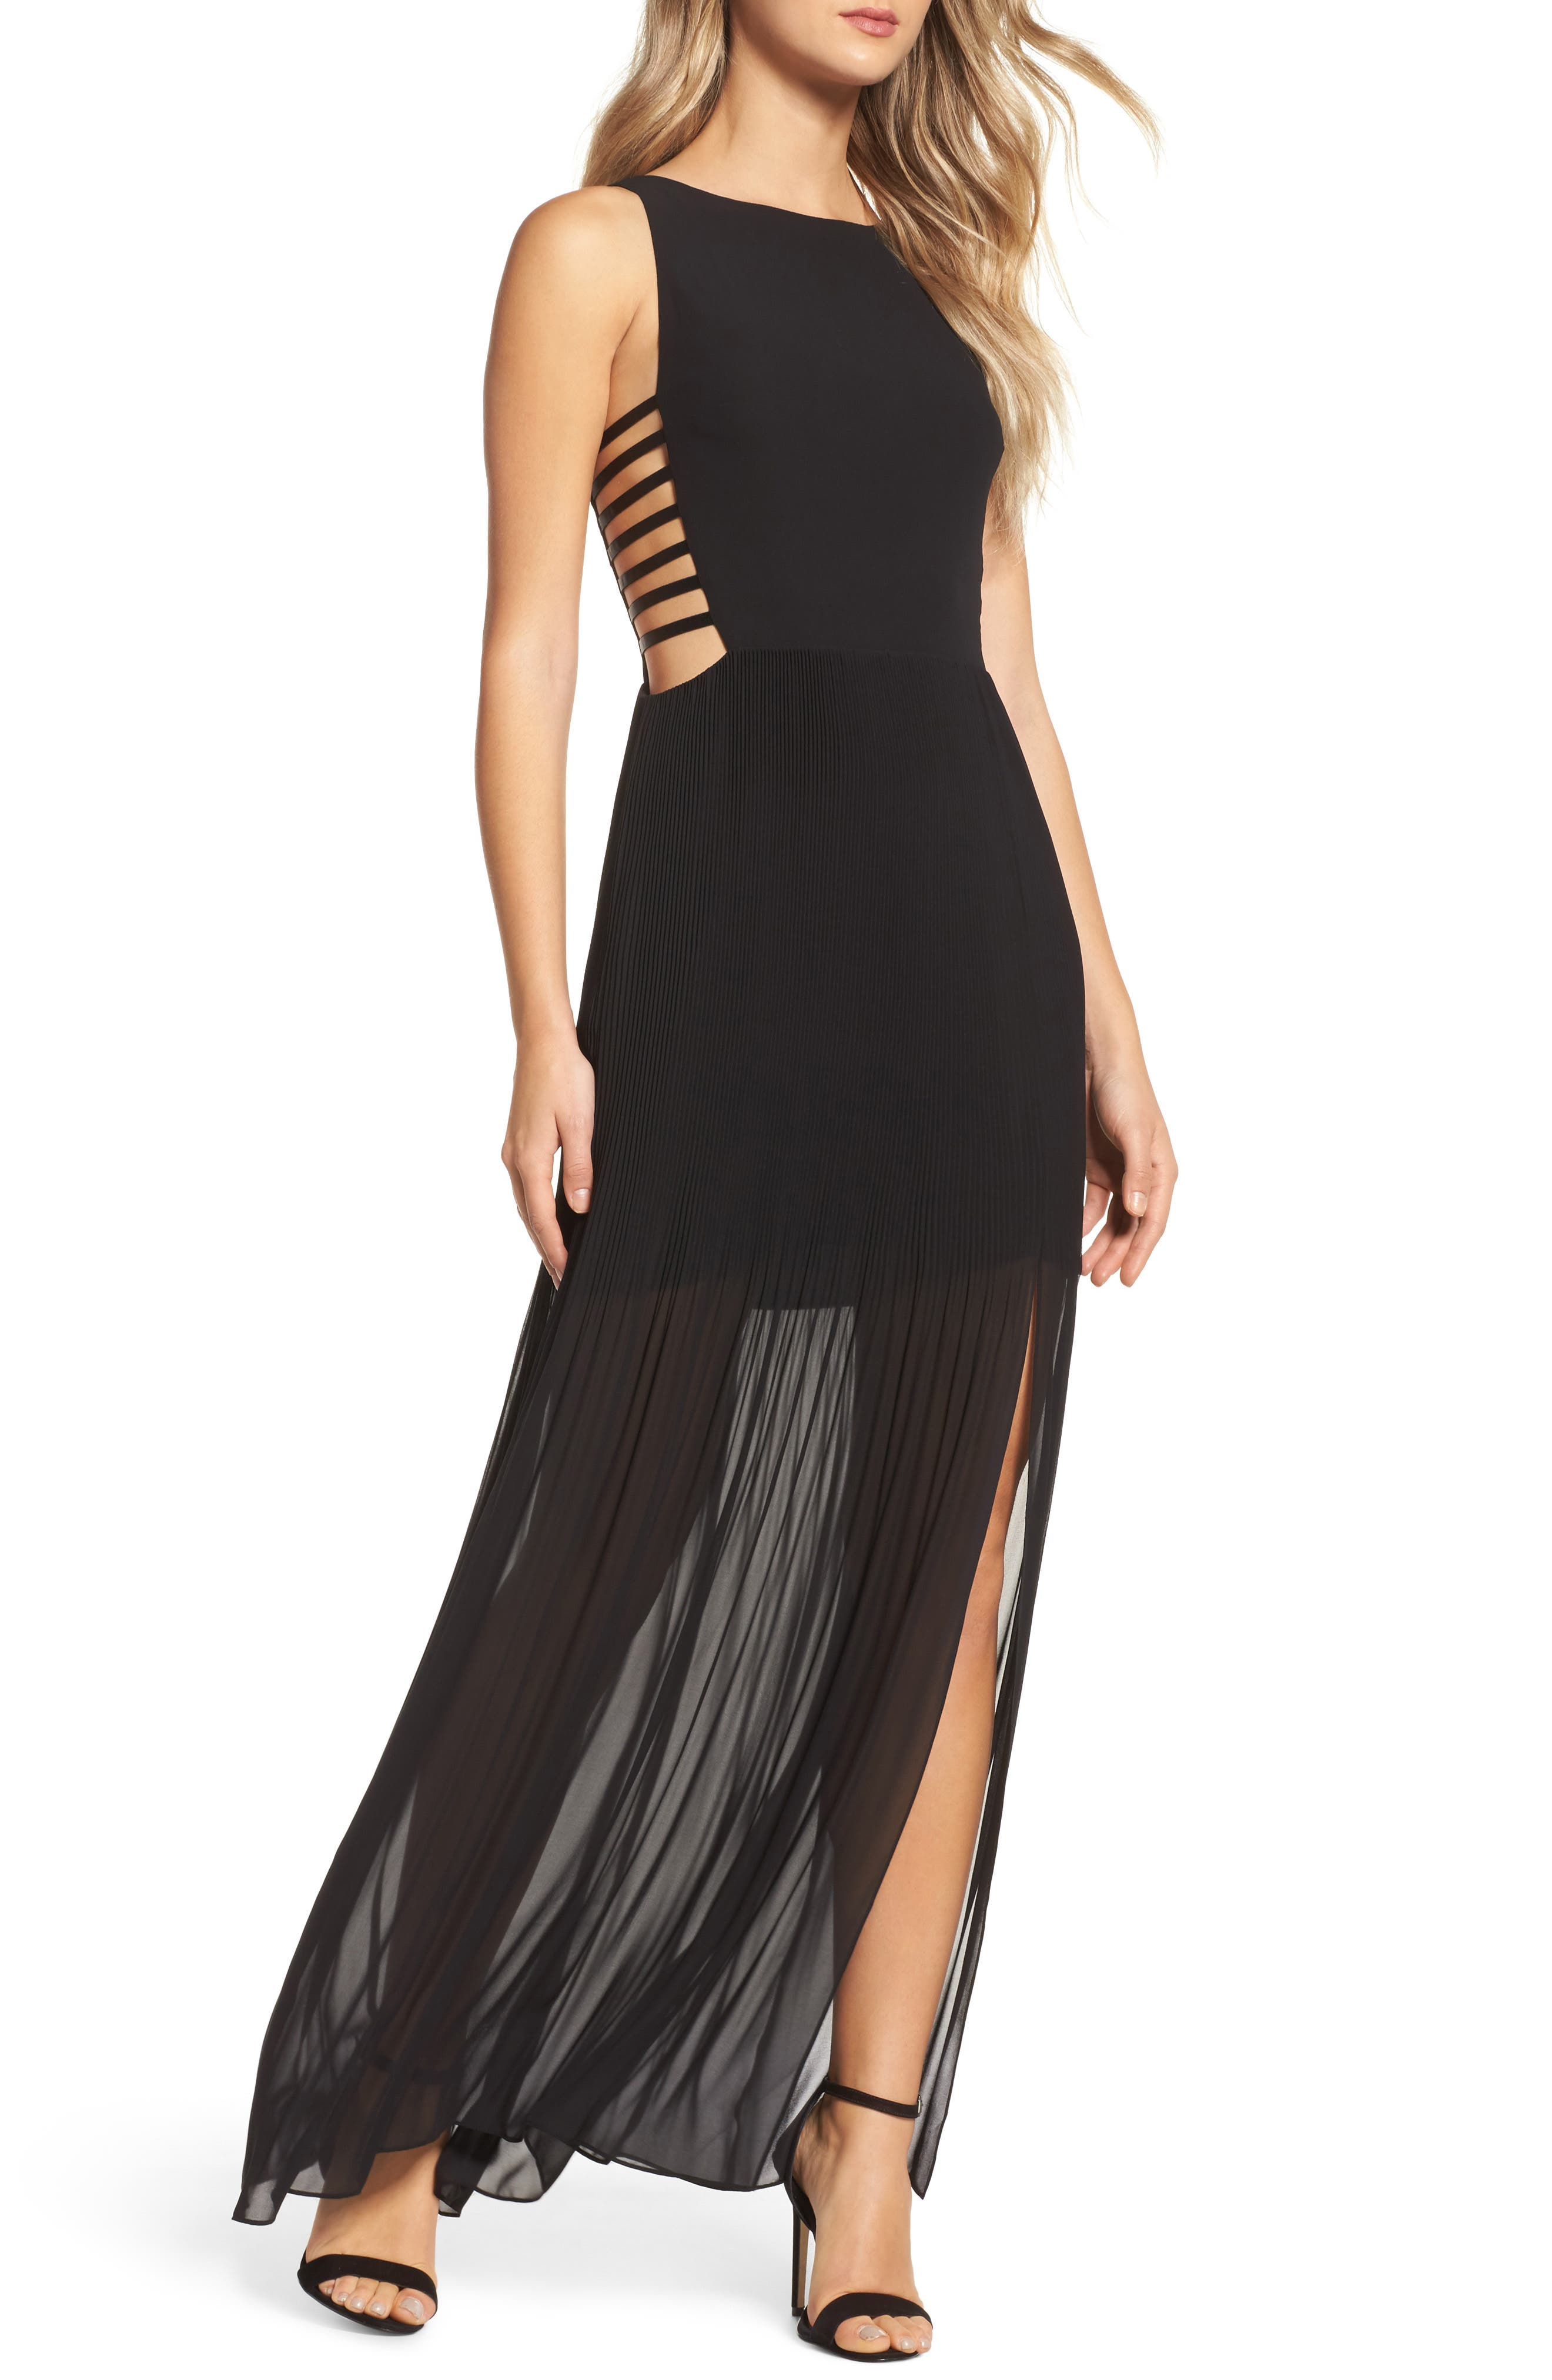 Sunset Blvd Maxi Dress,                             Main thumbnail 1, color,